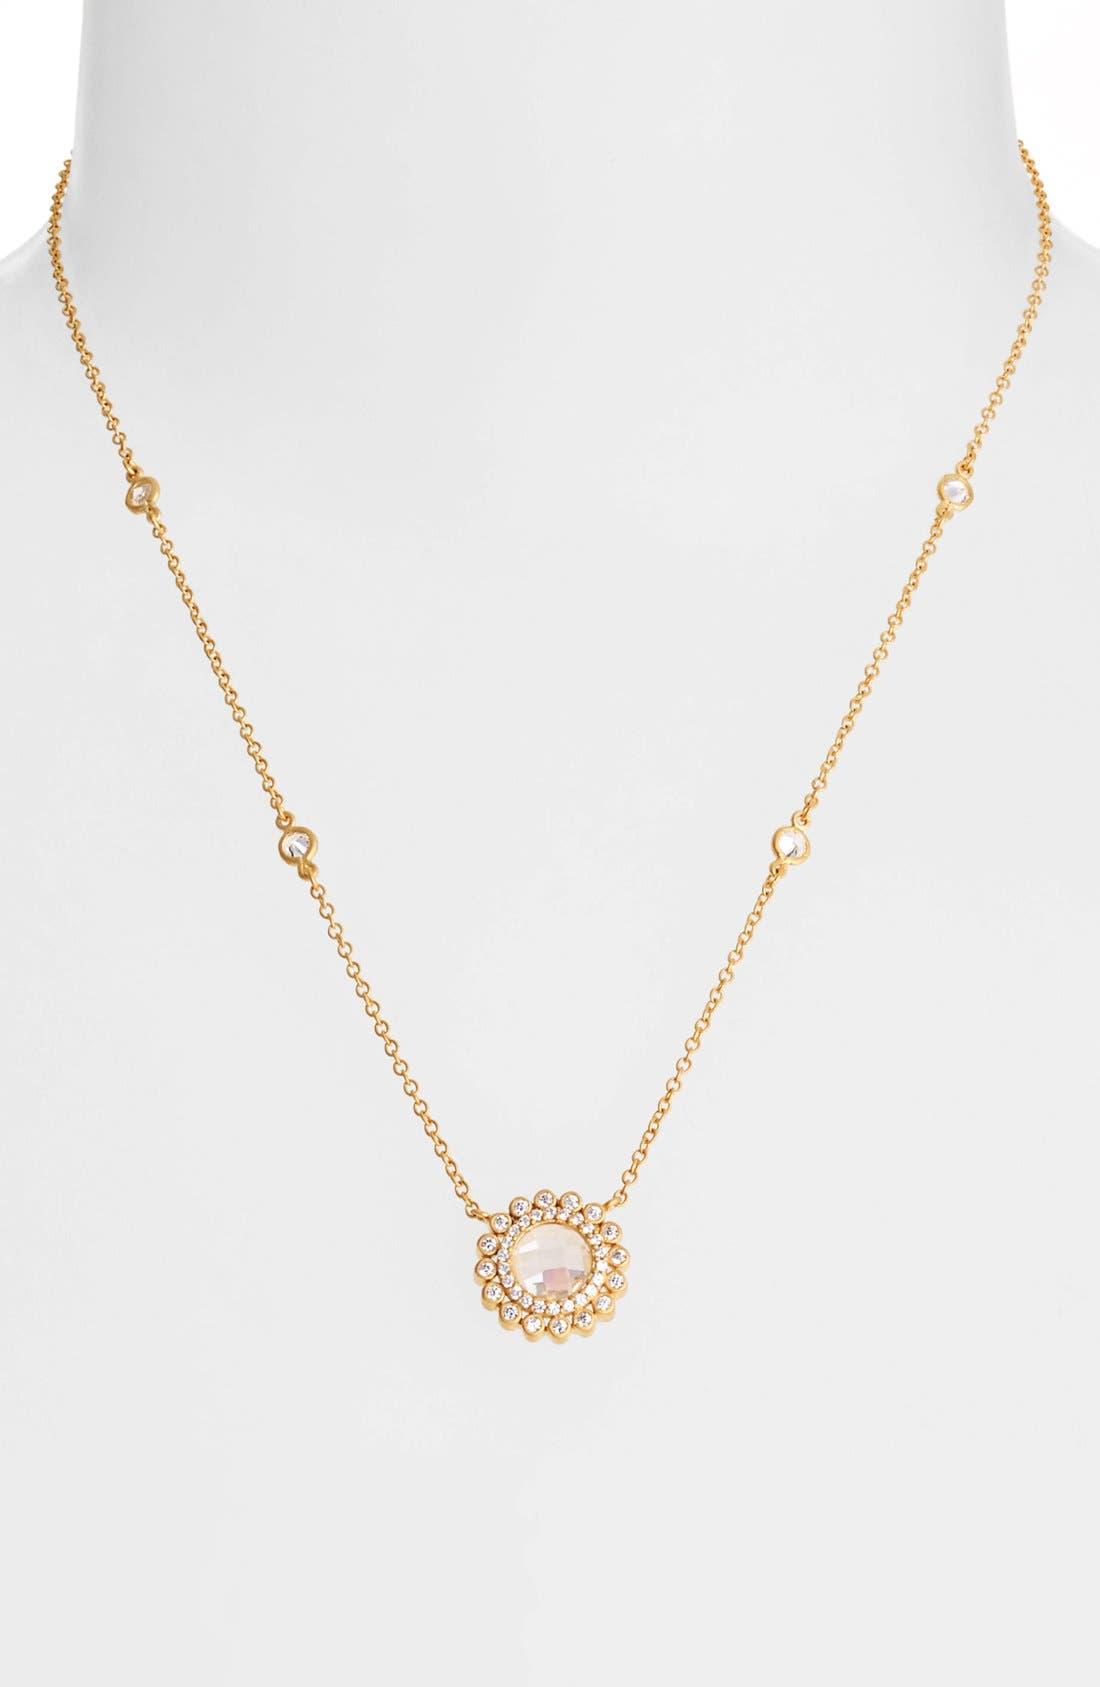 Alternate Image 1 Selected - FREIDA ROTHMAN 'Hamptons' Wildflower Pendant Necklace